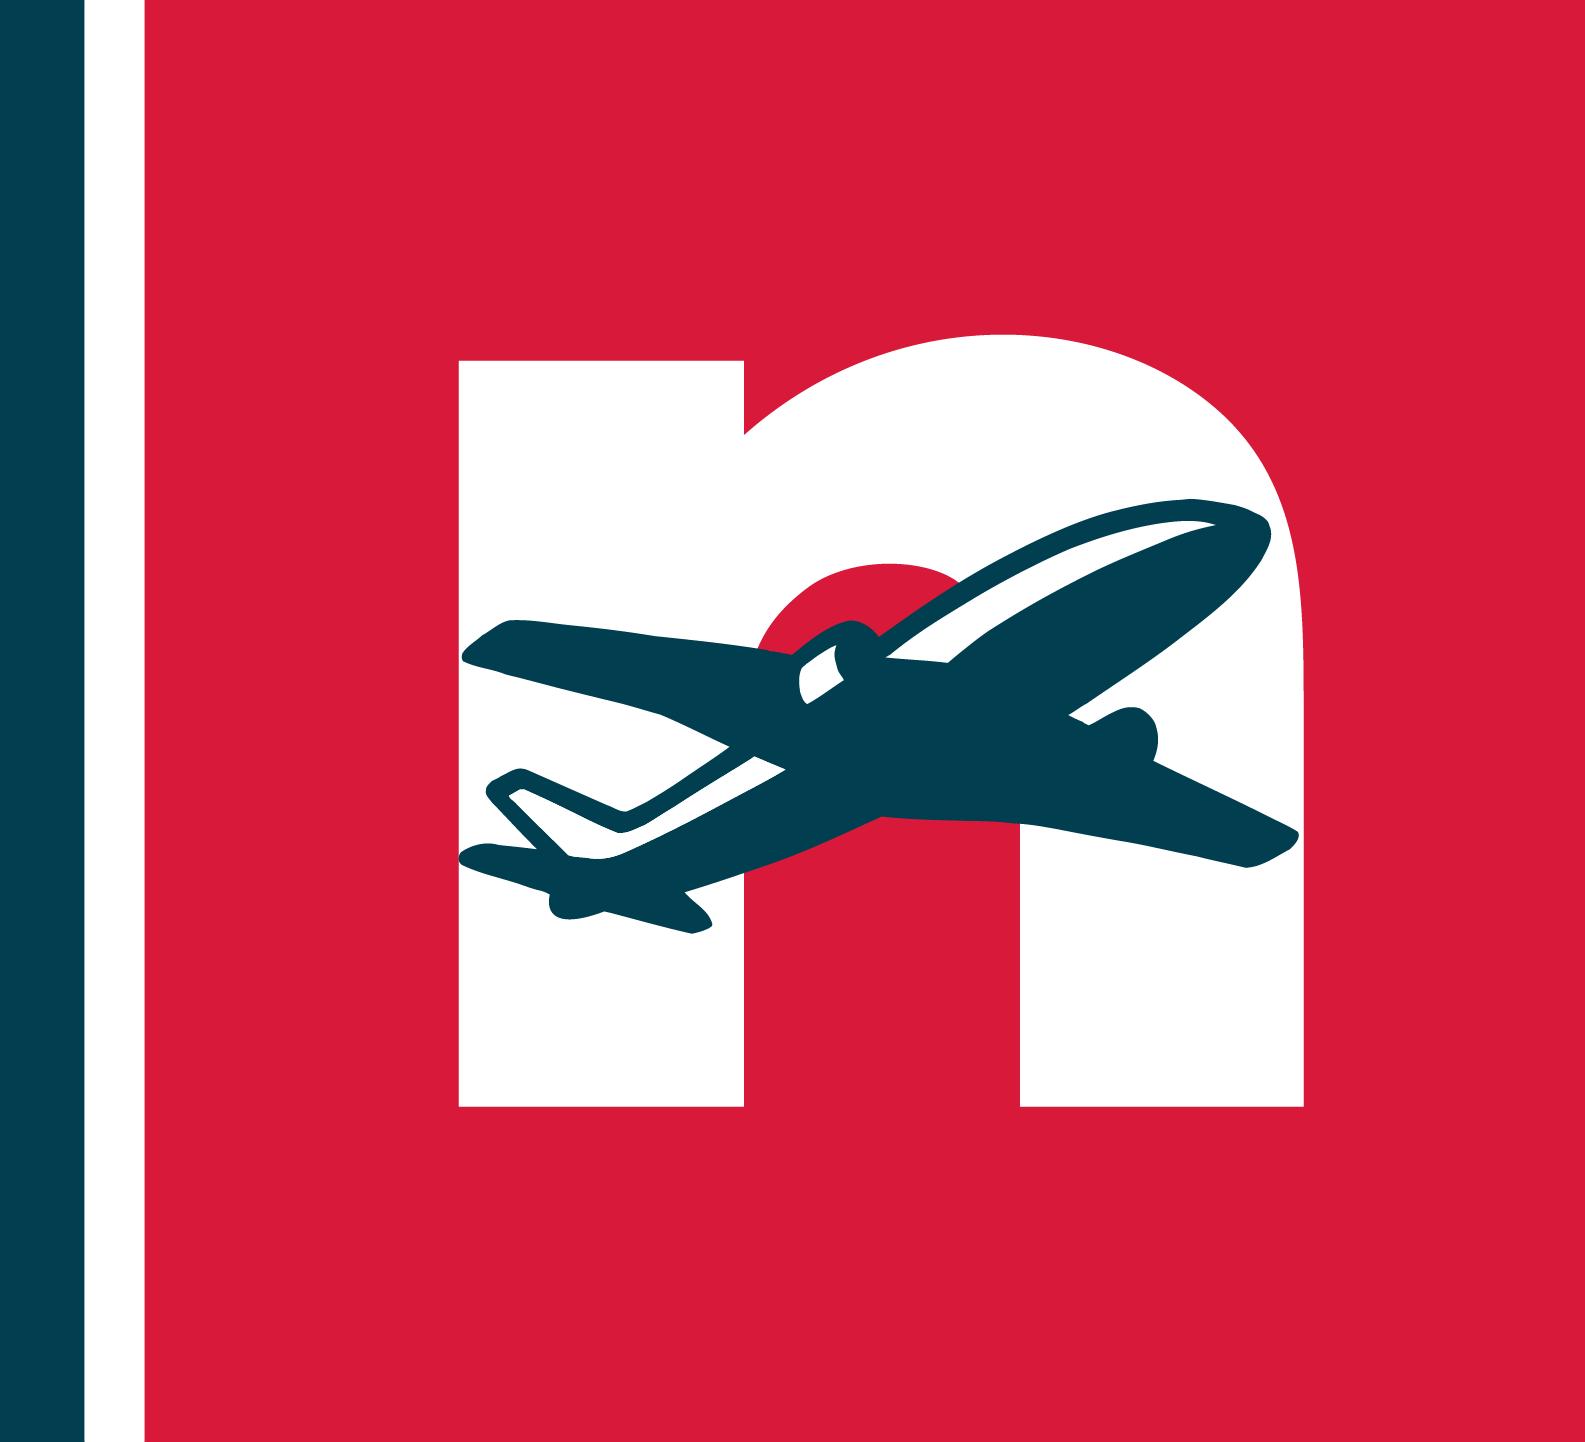 Norwegian Air Norway